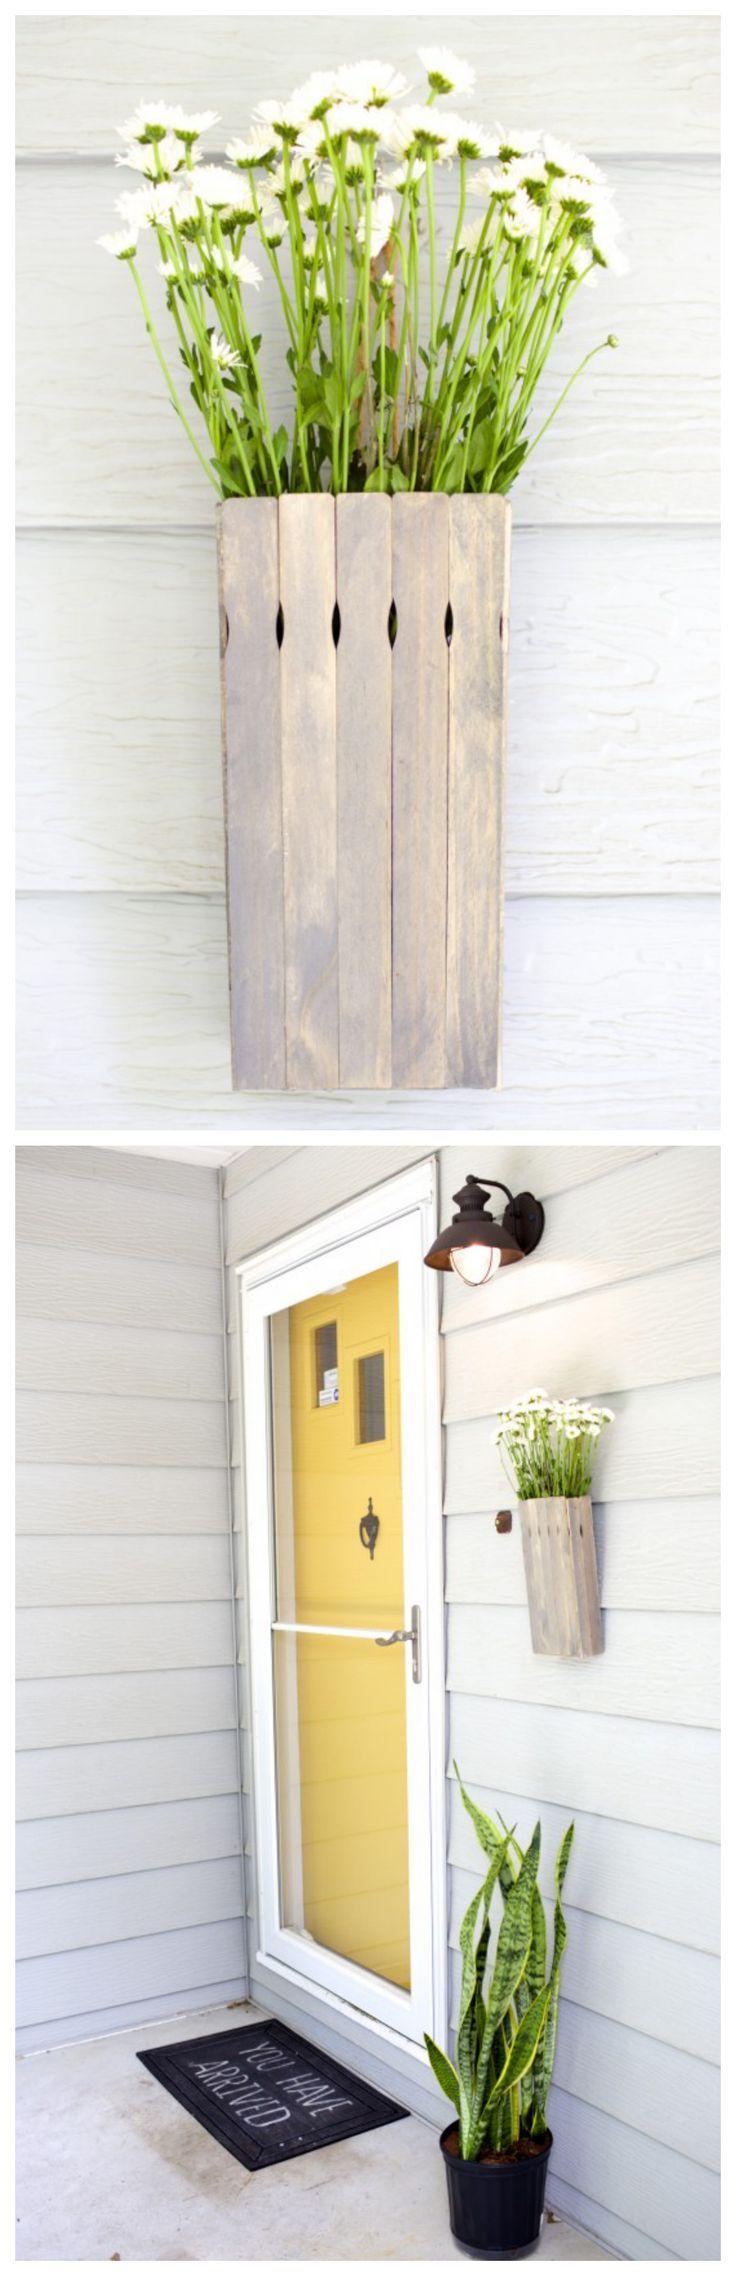 53 best Homemade home decor images on Pinterest | Creative ideas ...